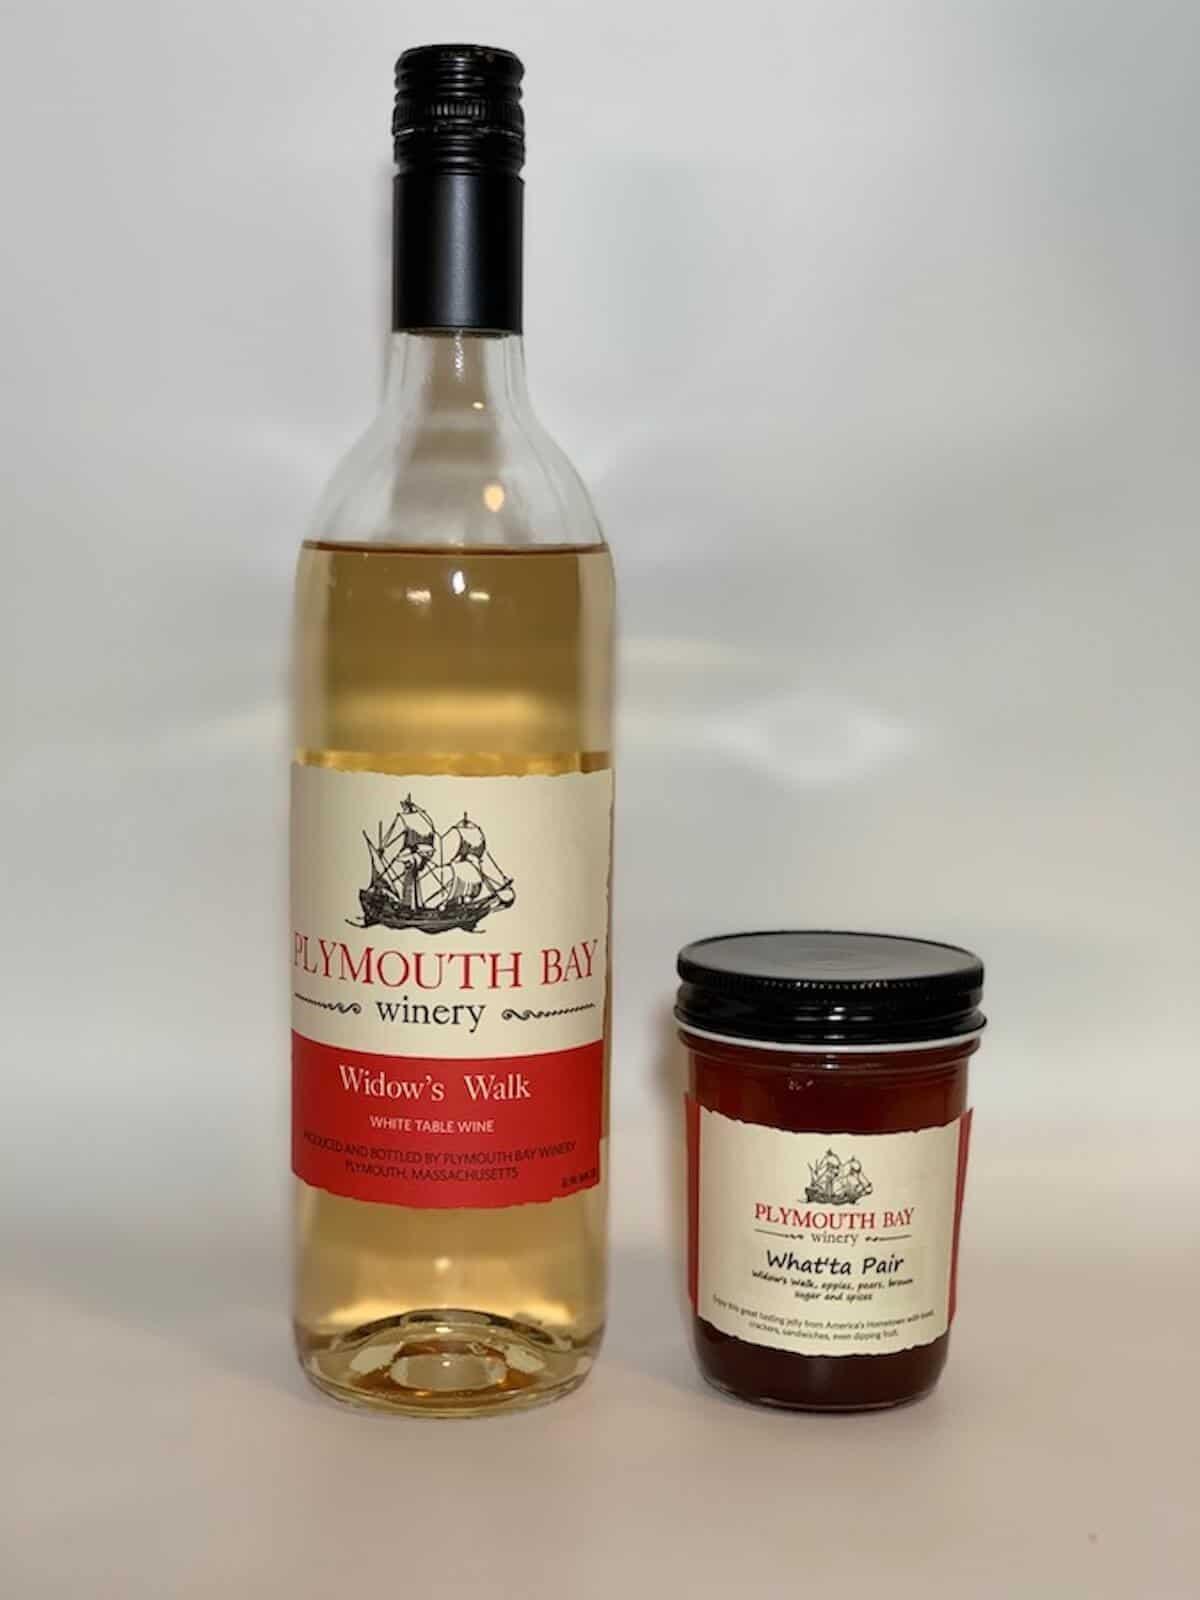 Plymouth Bay Winery Widow's Walk wine with What'ta Pair jam